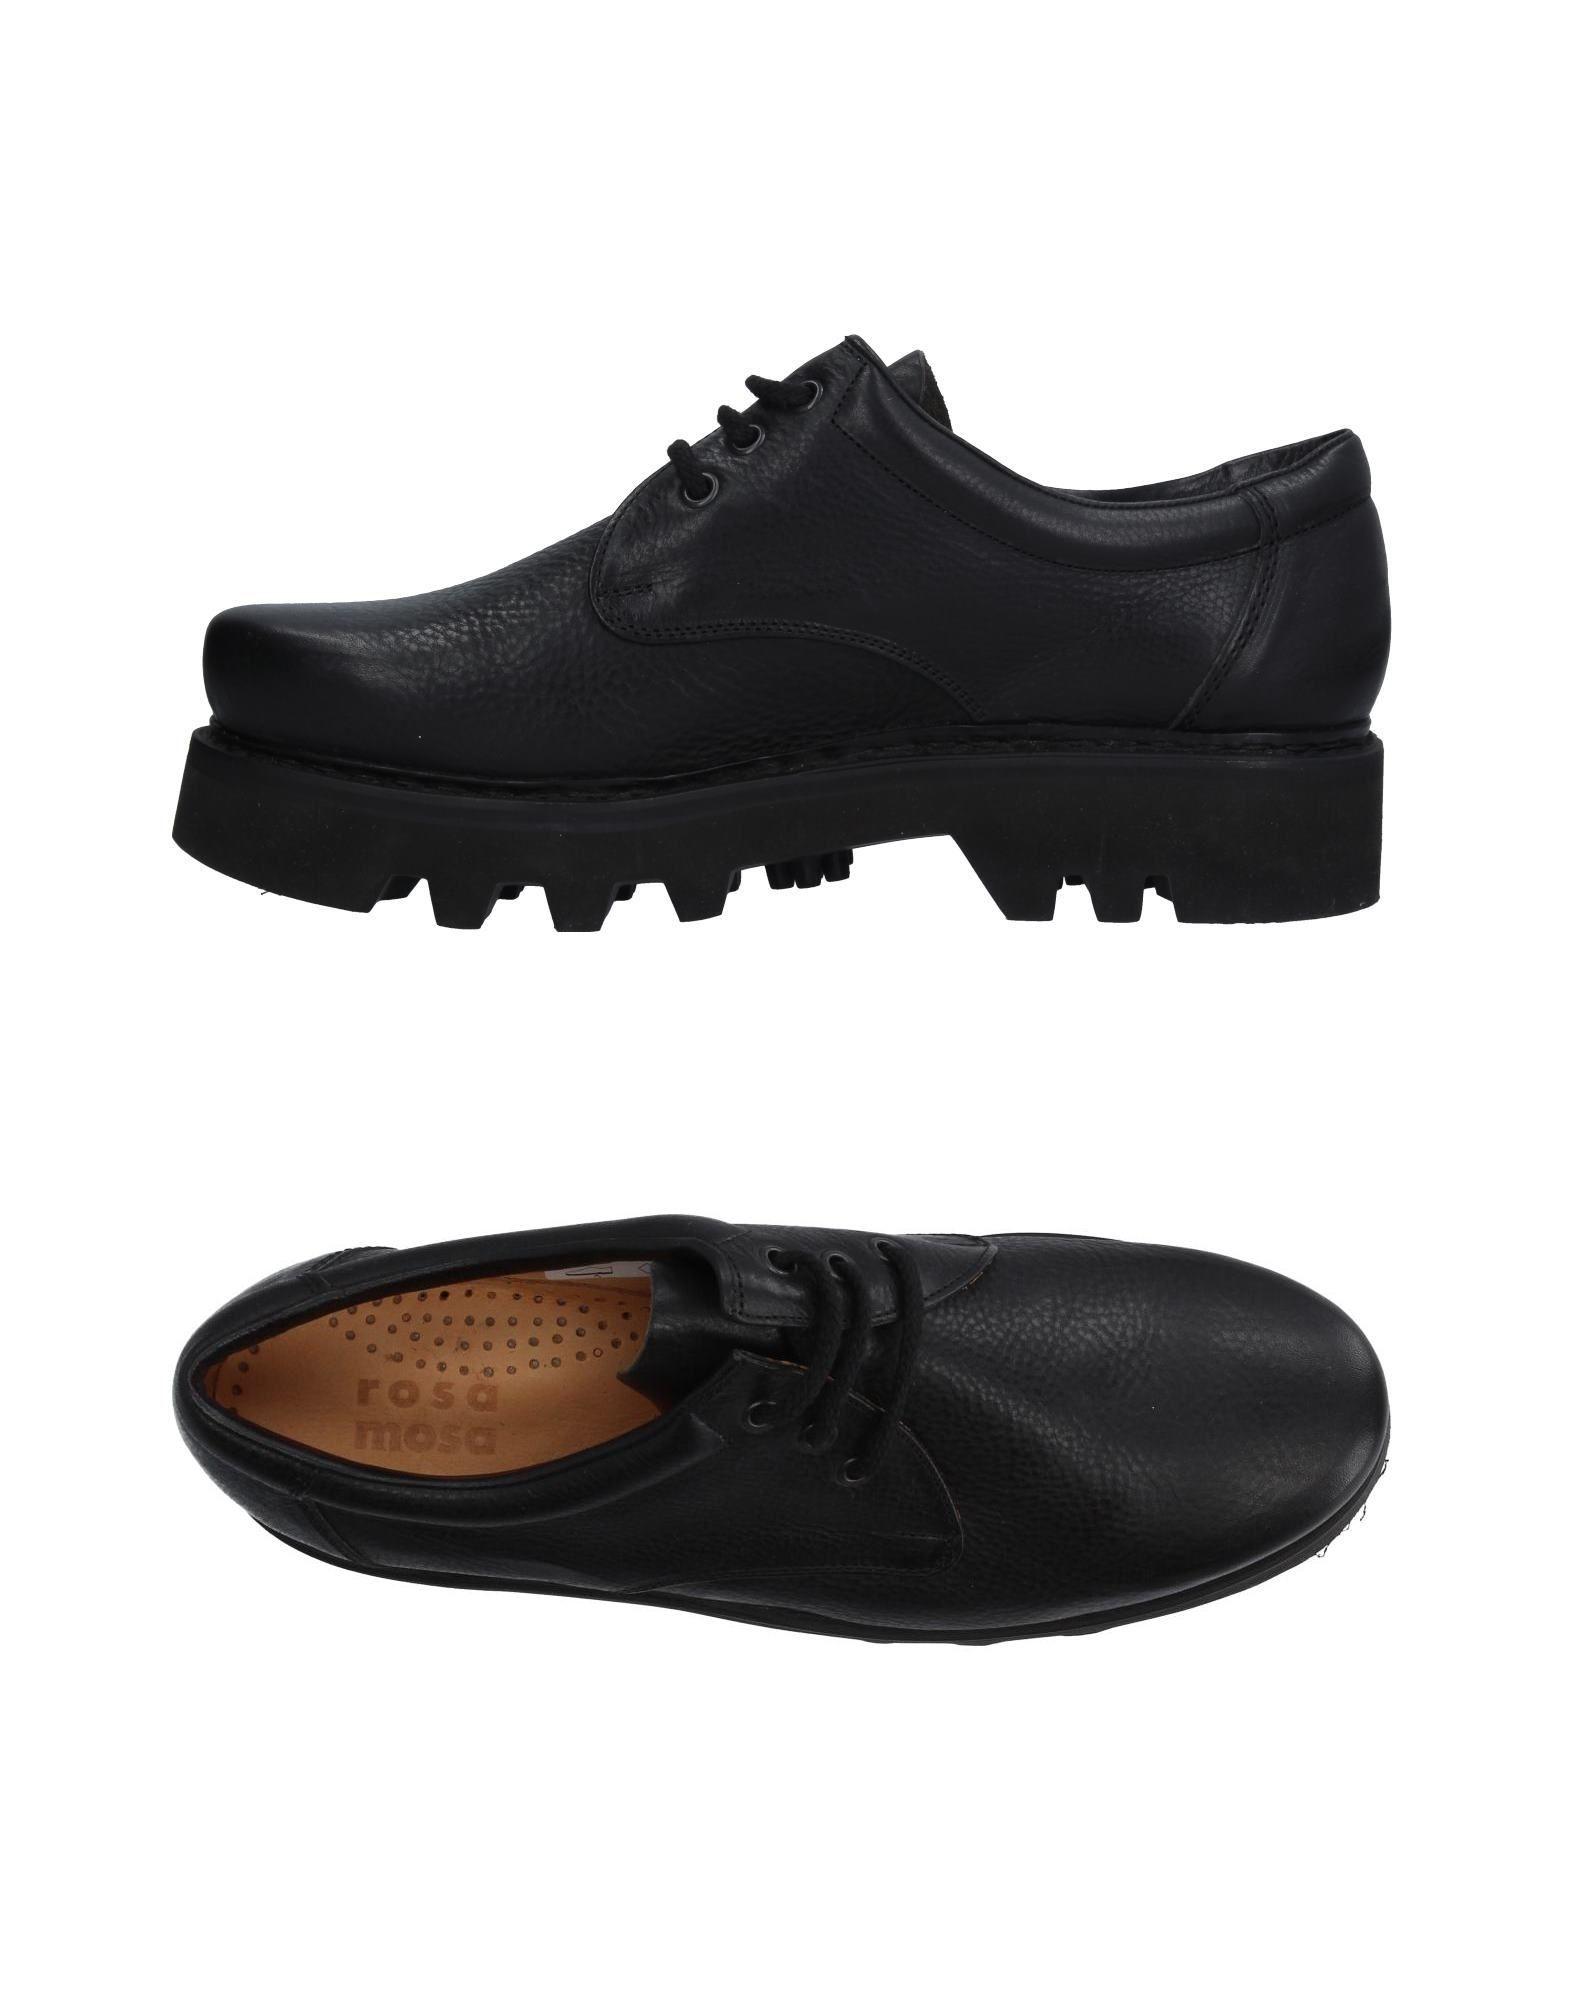 CHAUSSURES - Chaussures à lacetsSeventy DbxRk6dx